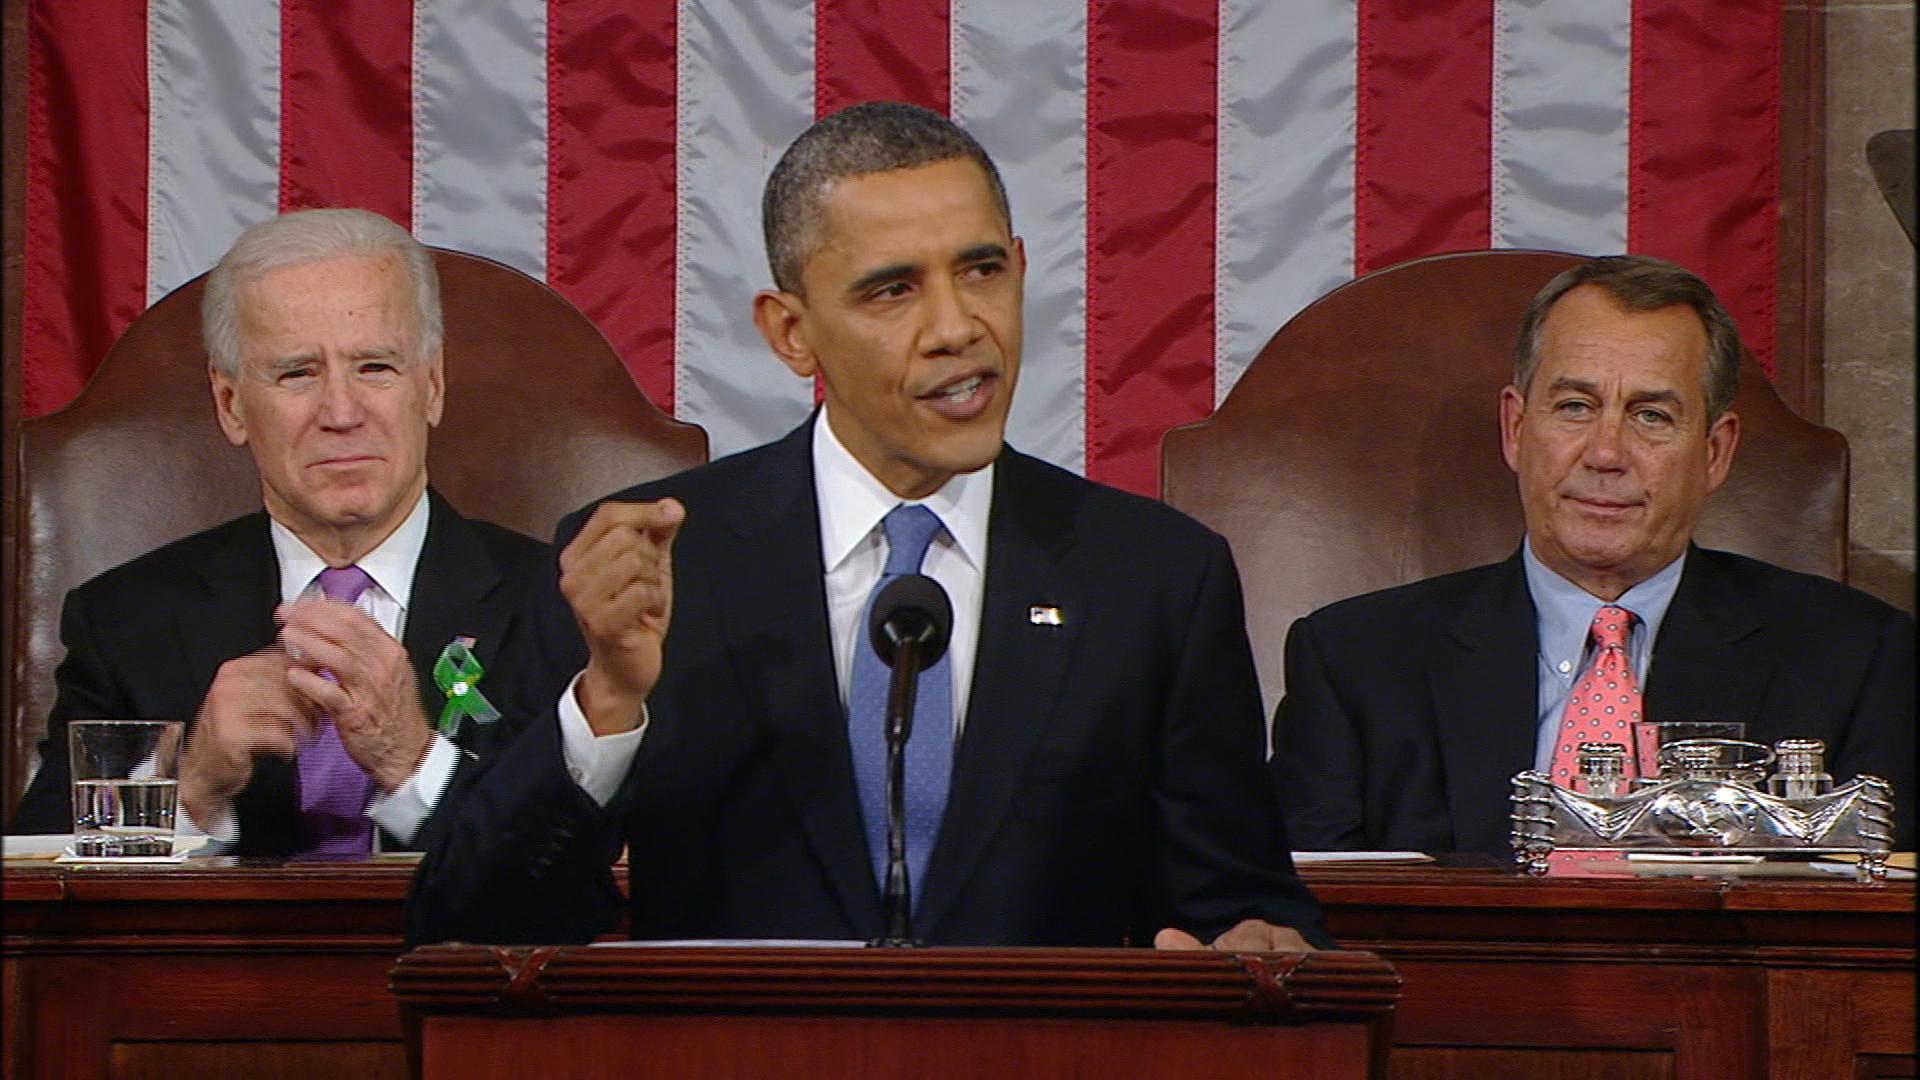 Obama's income inequality fight